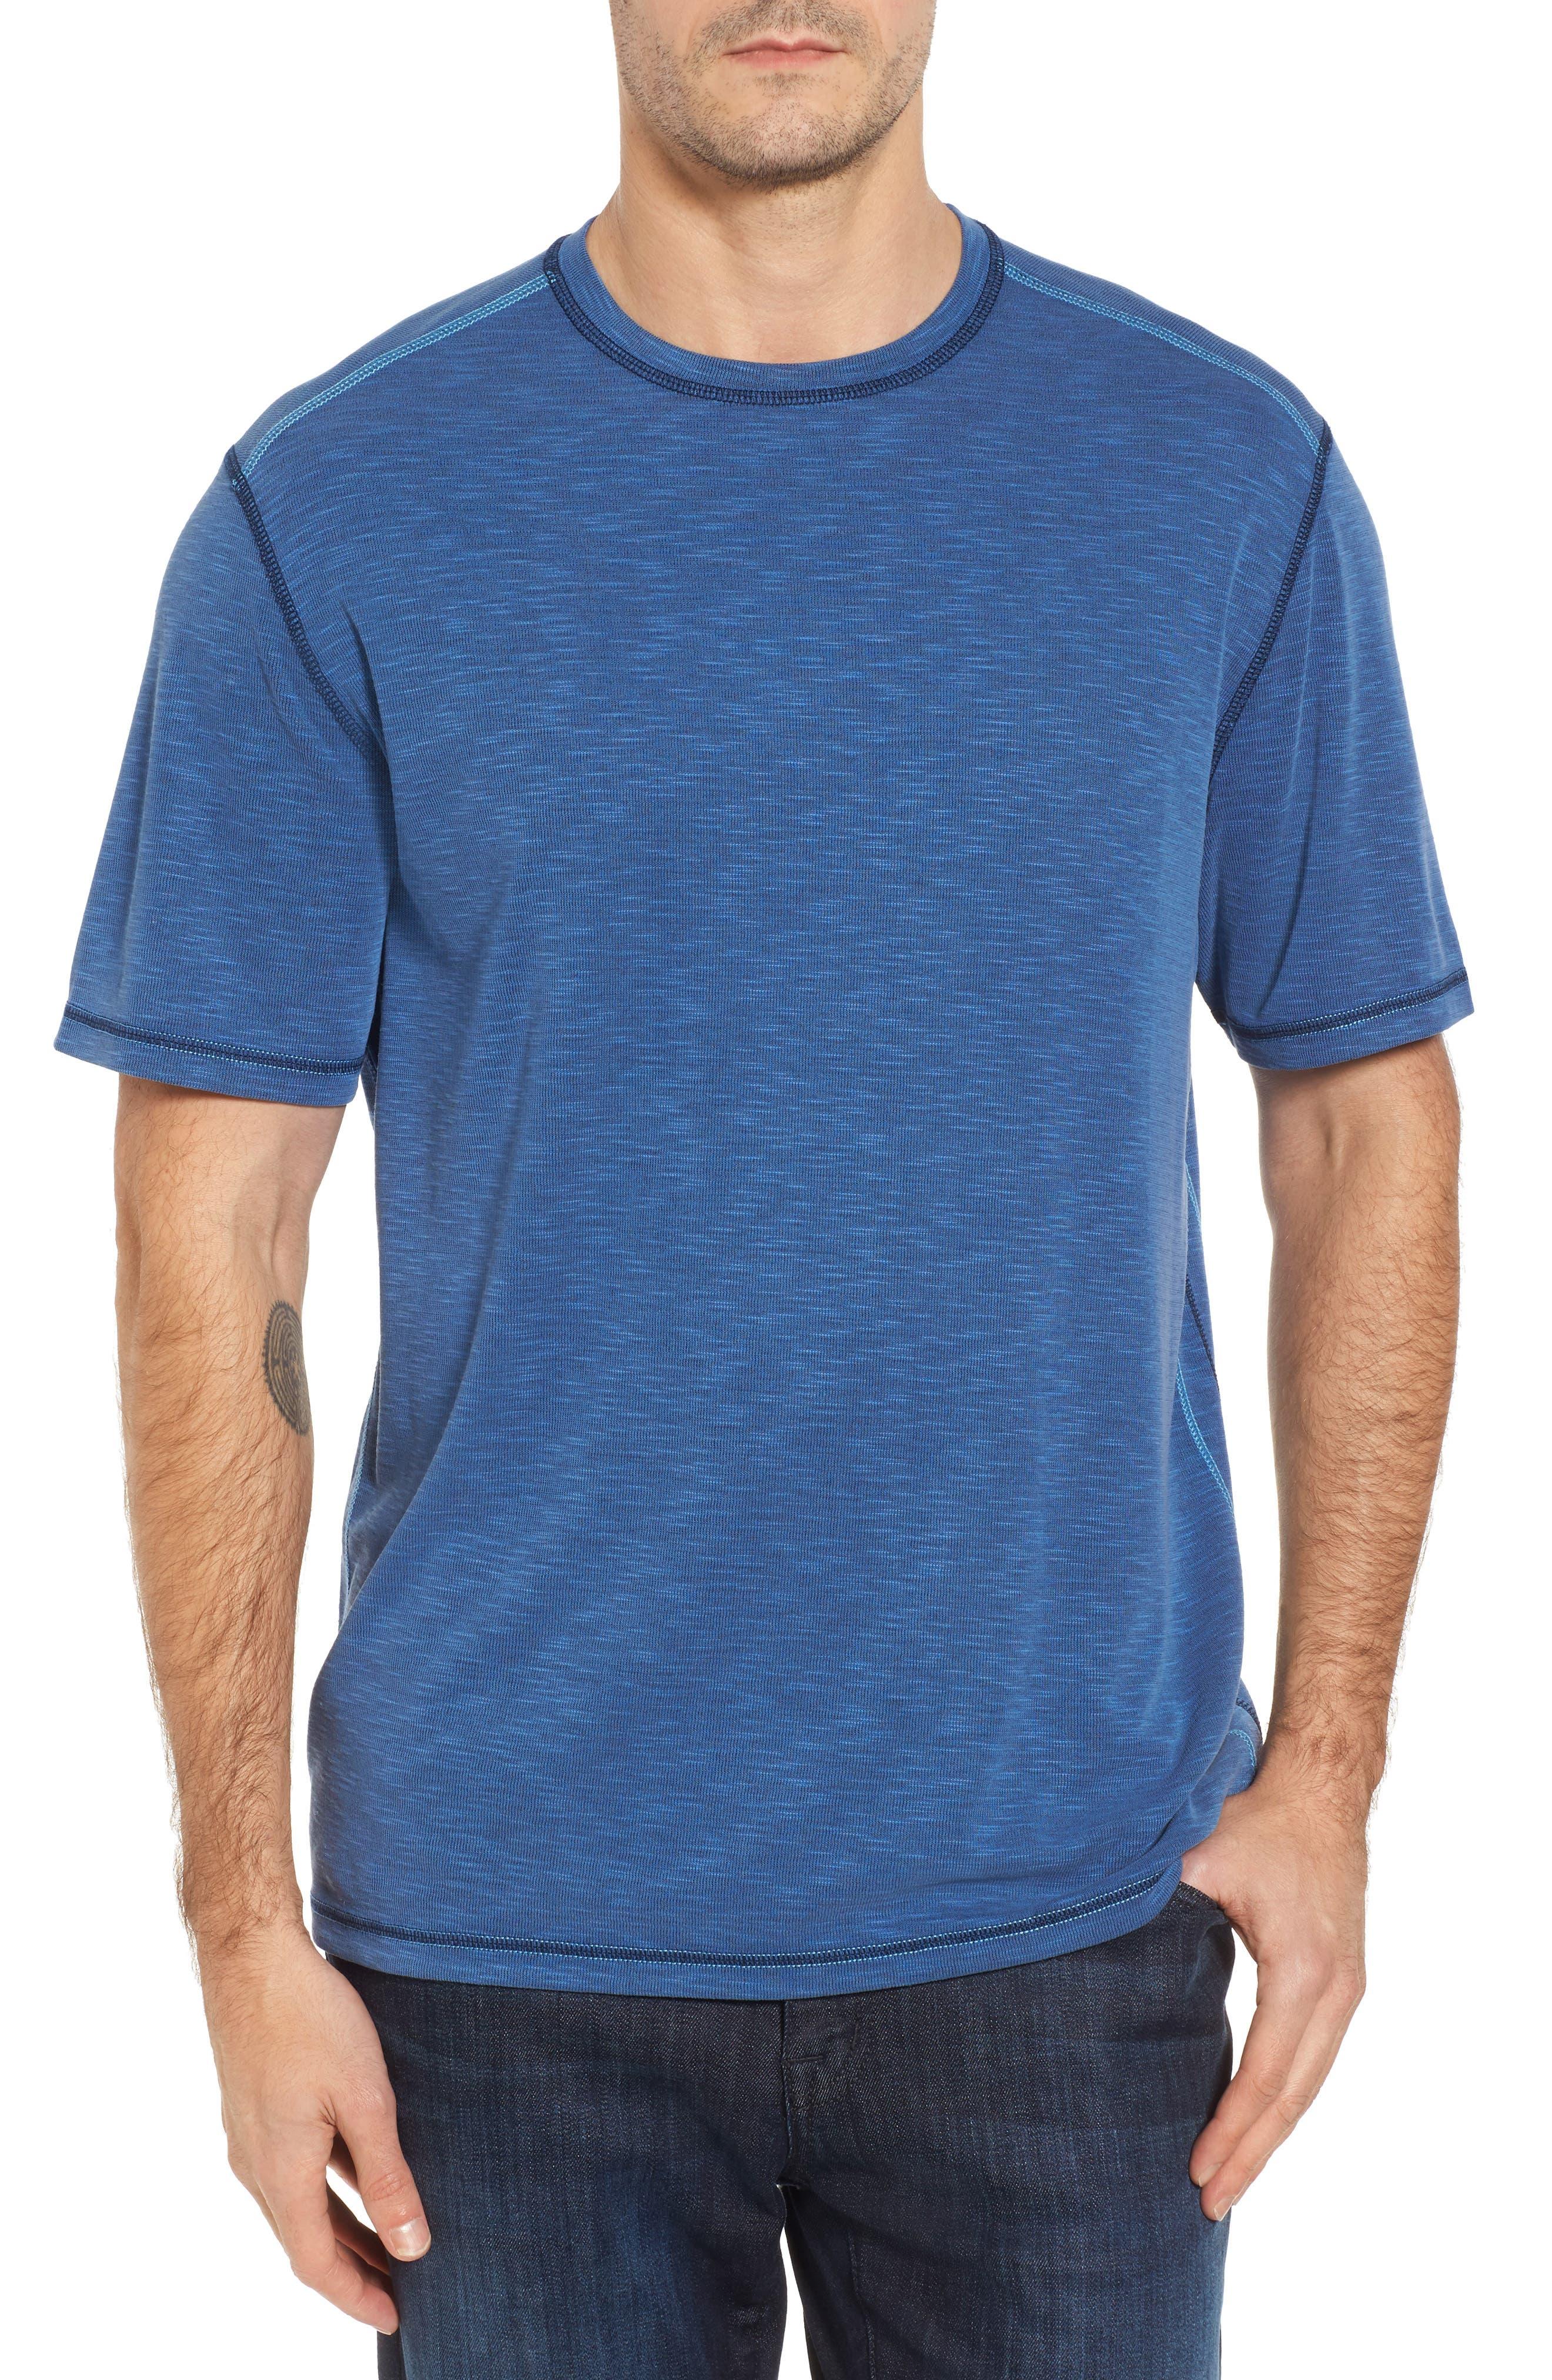 Flip Tide T-Shirt,                         Main,                         color, Galaxy Blue